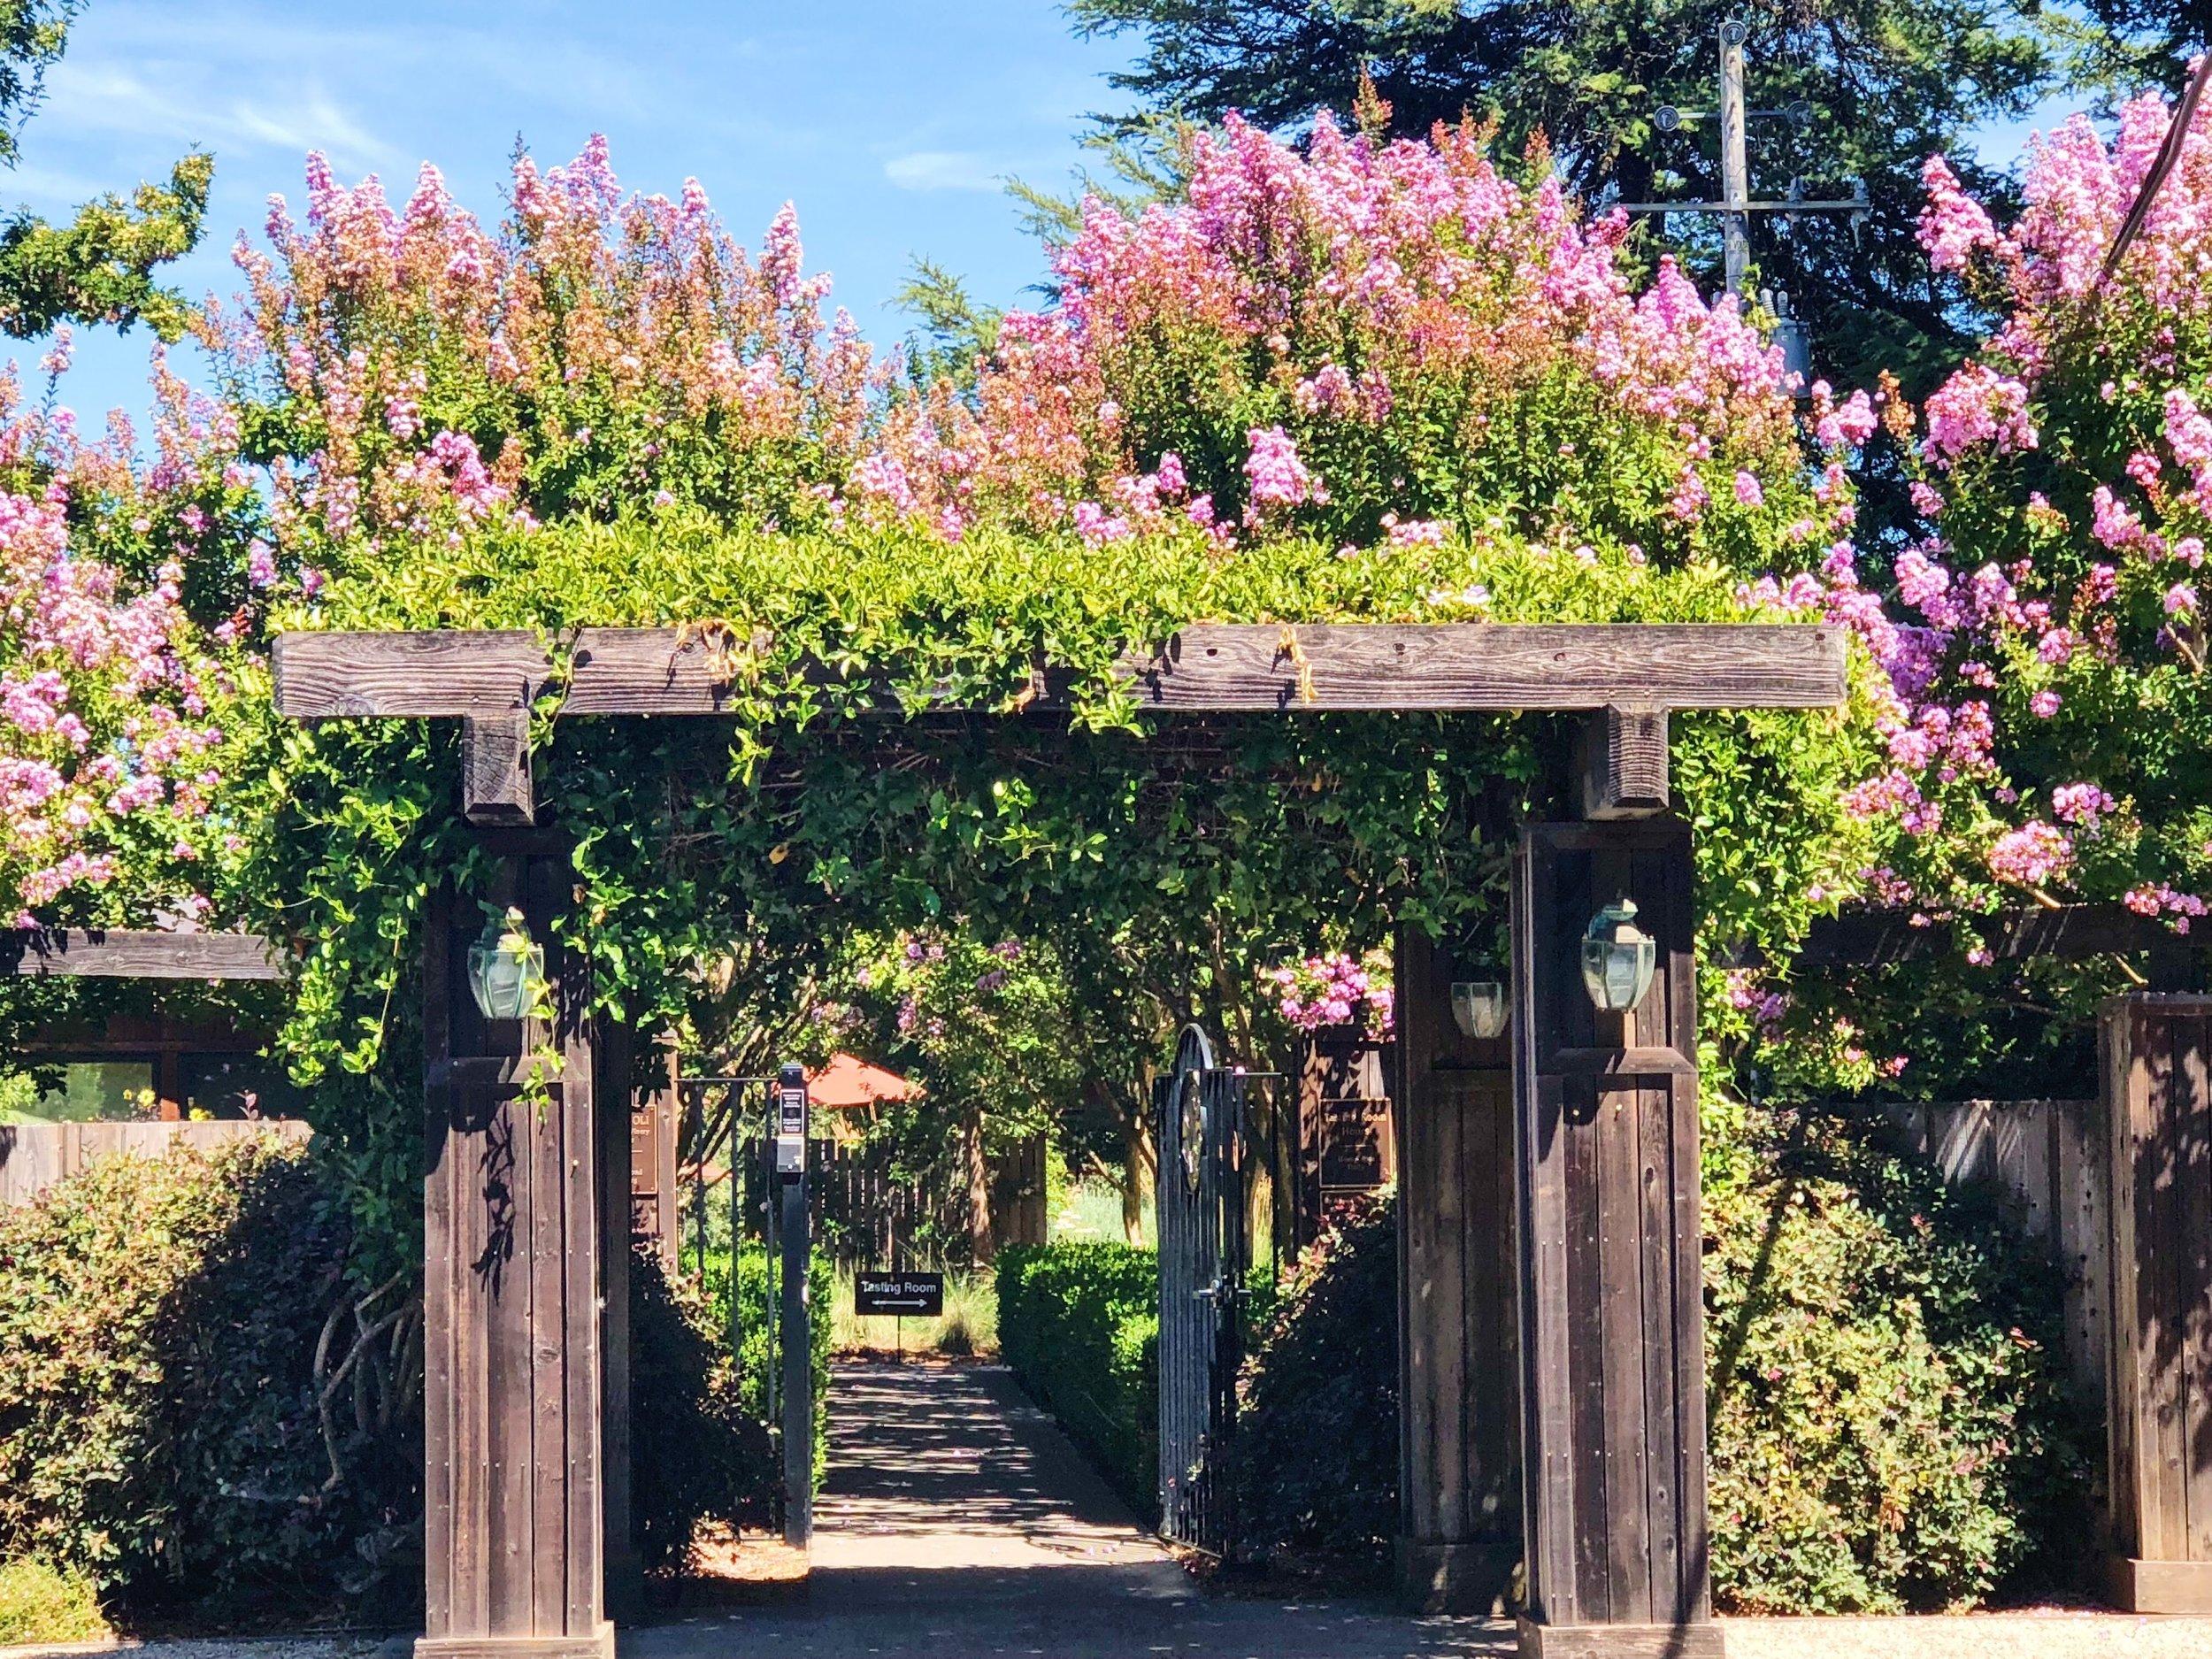 Rochioli Winery Flowers Blooming